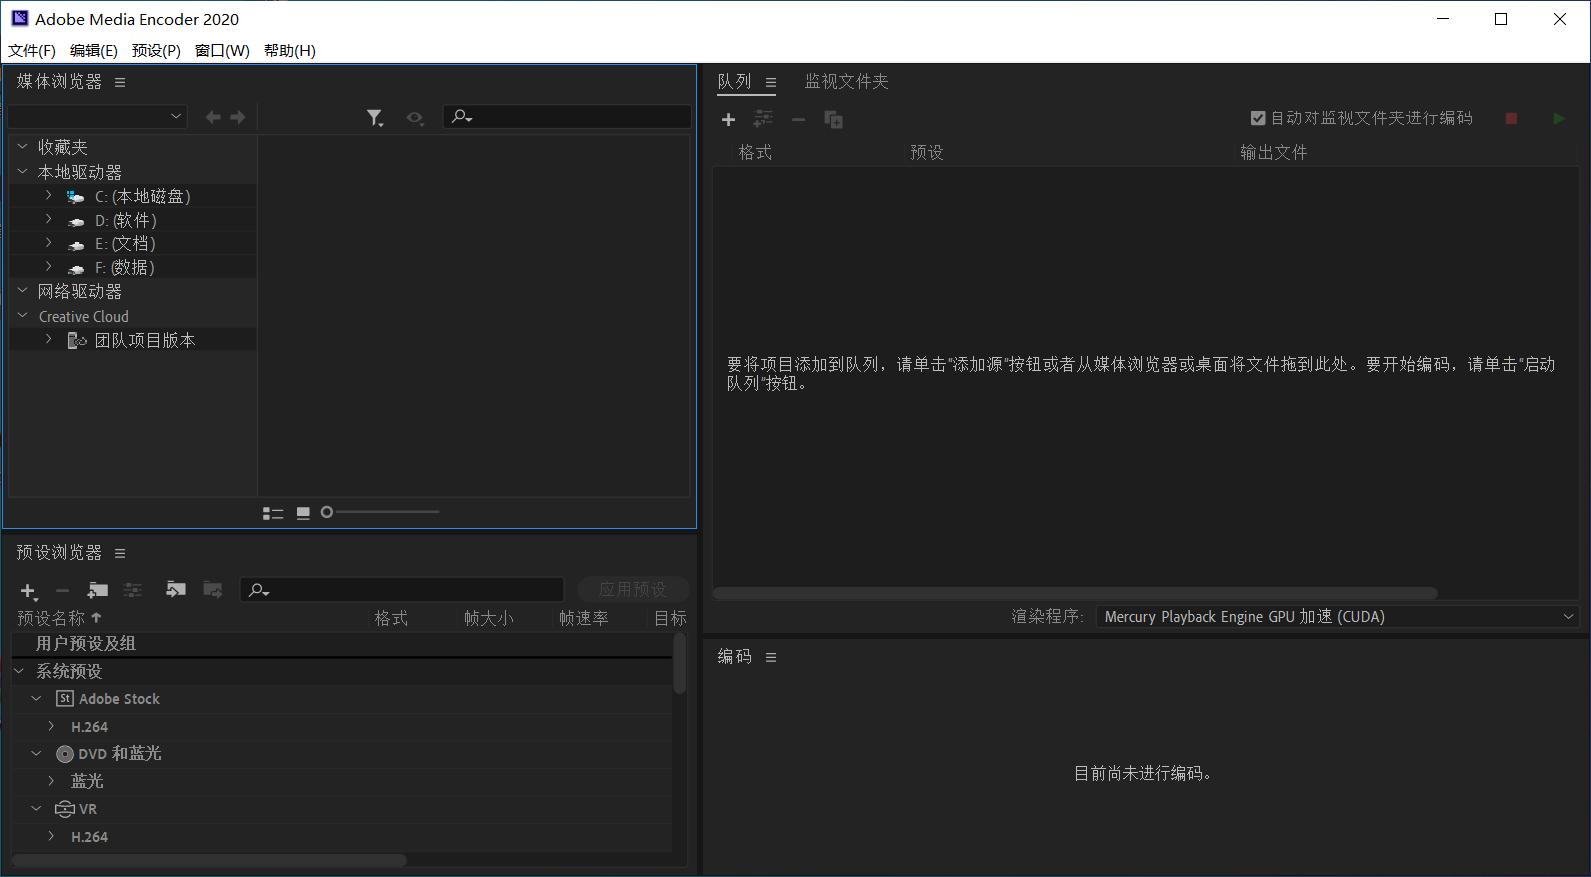 Adobe Media Encoder 2020.png